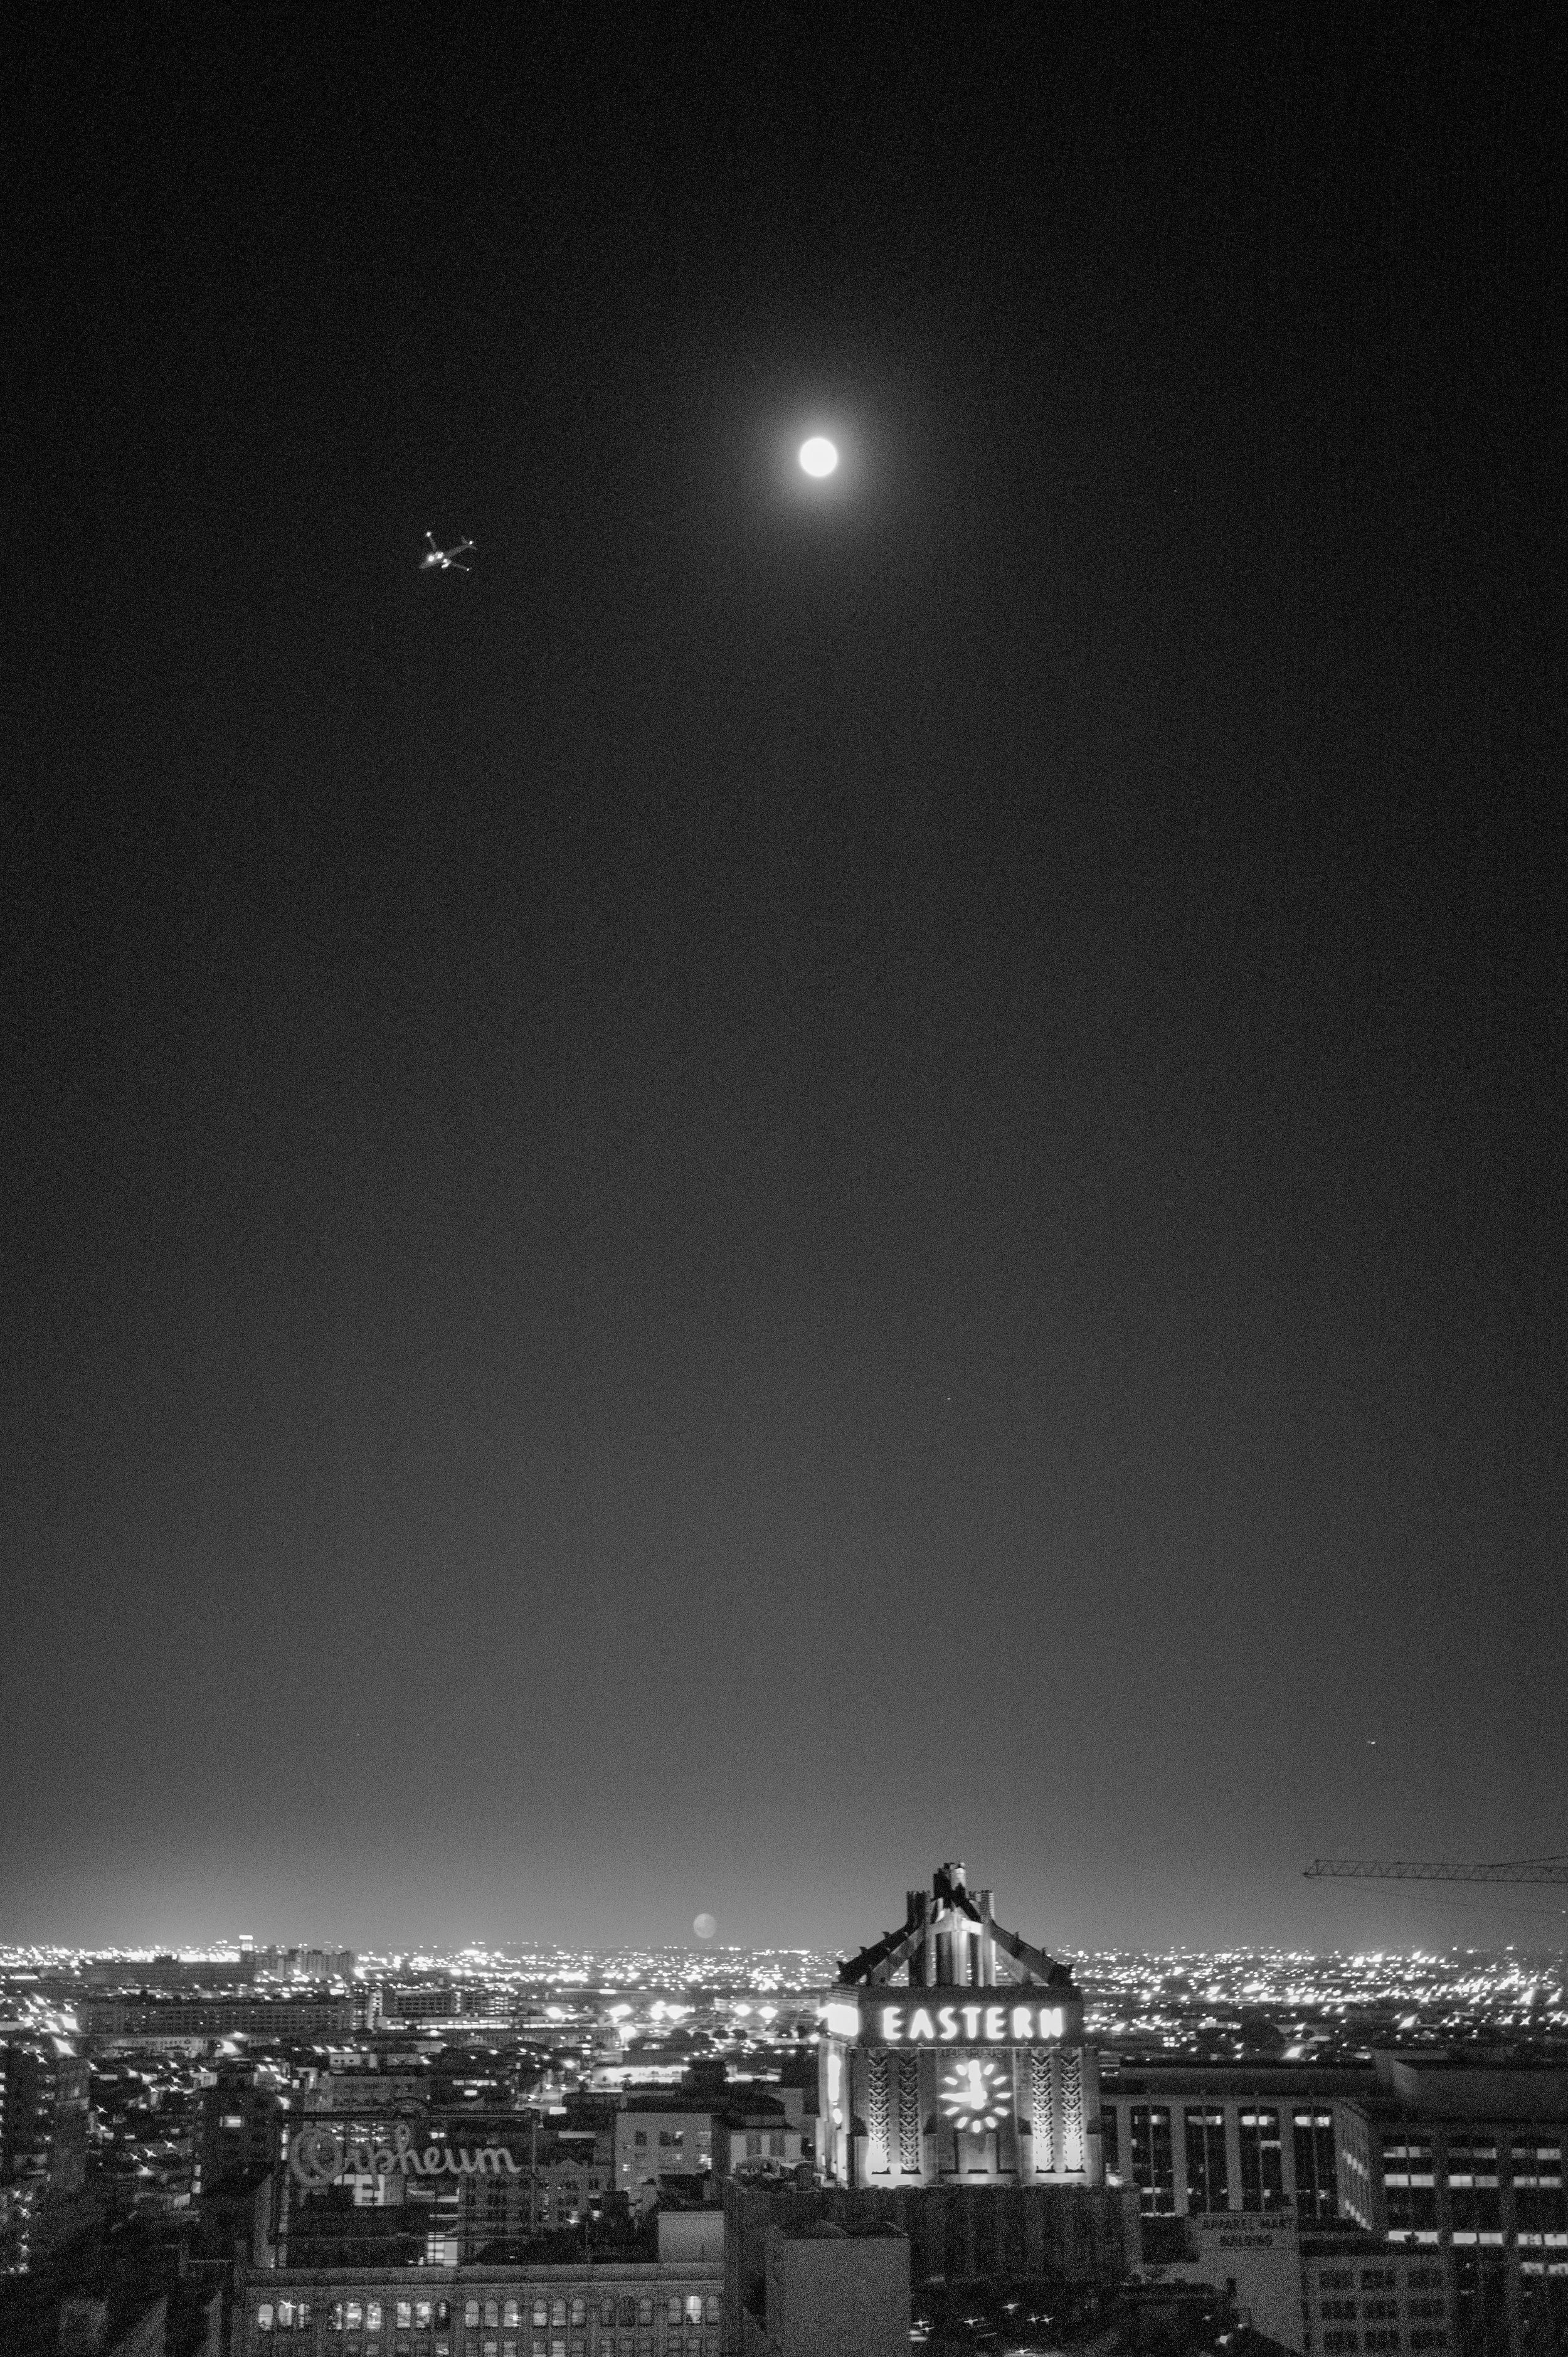 Eastern Moon